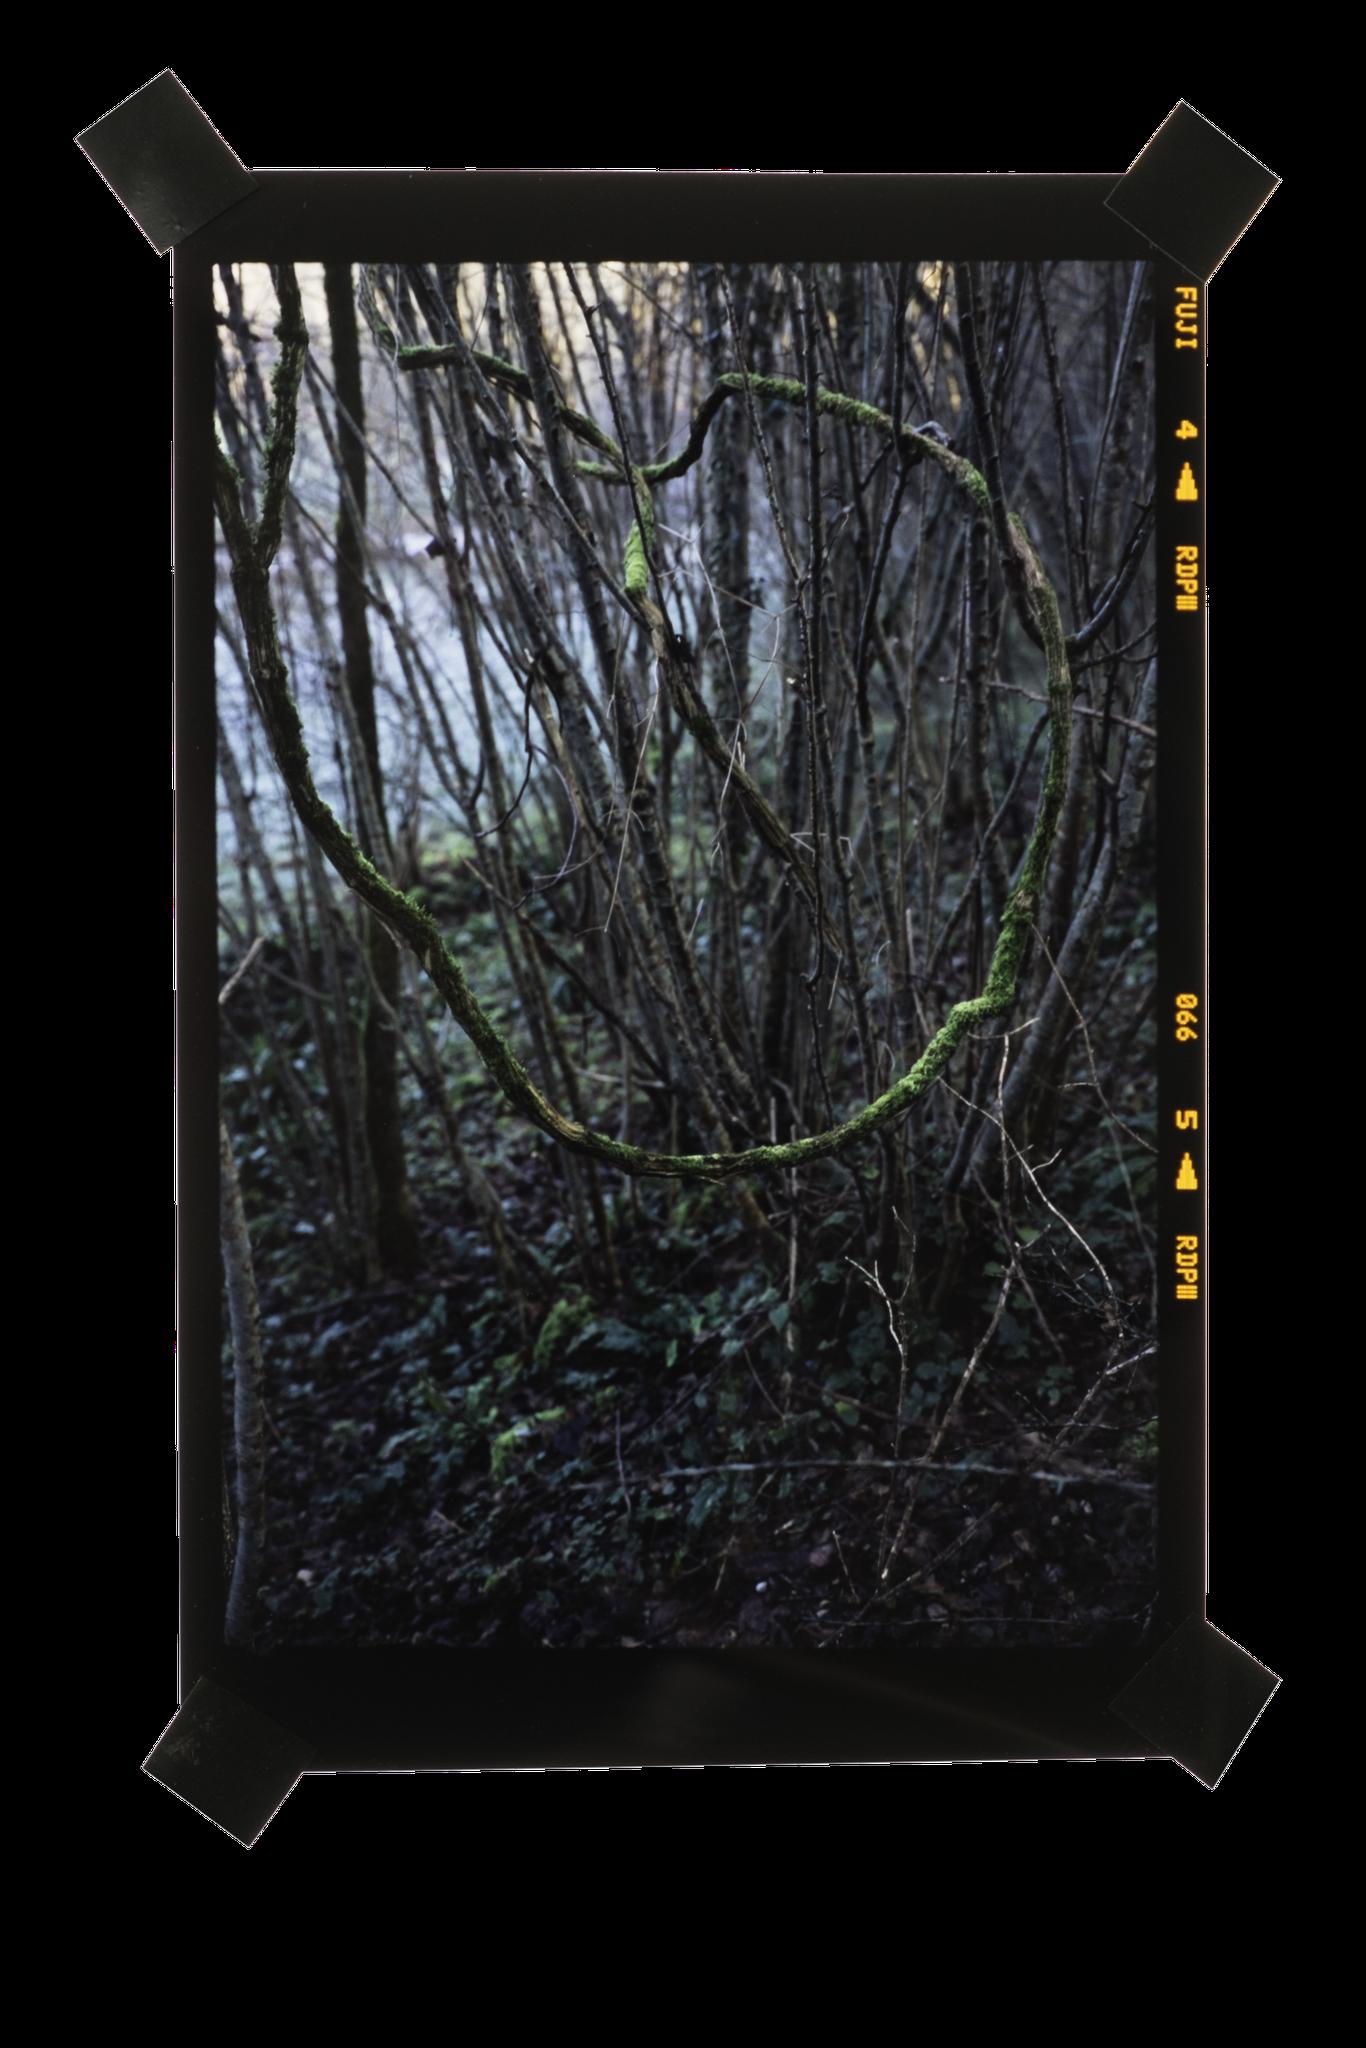 Film inversible 6x9